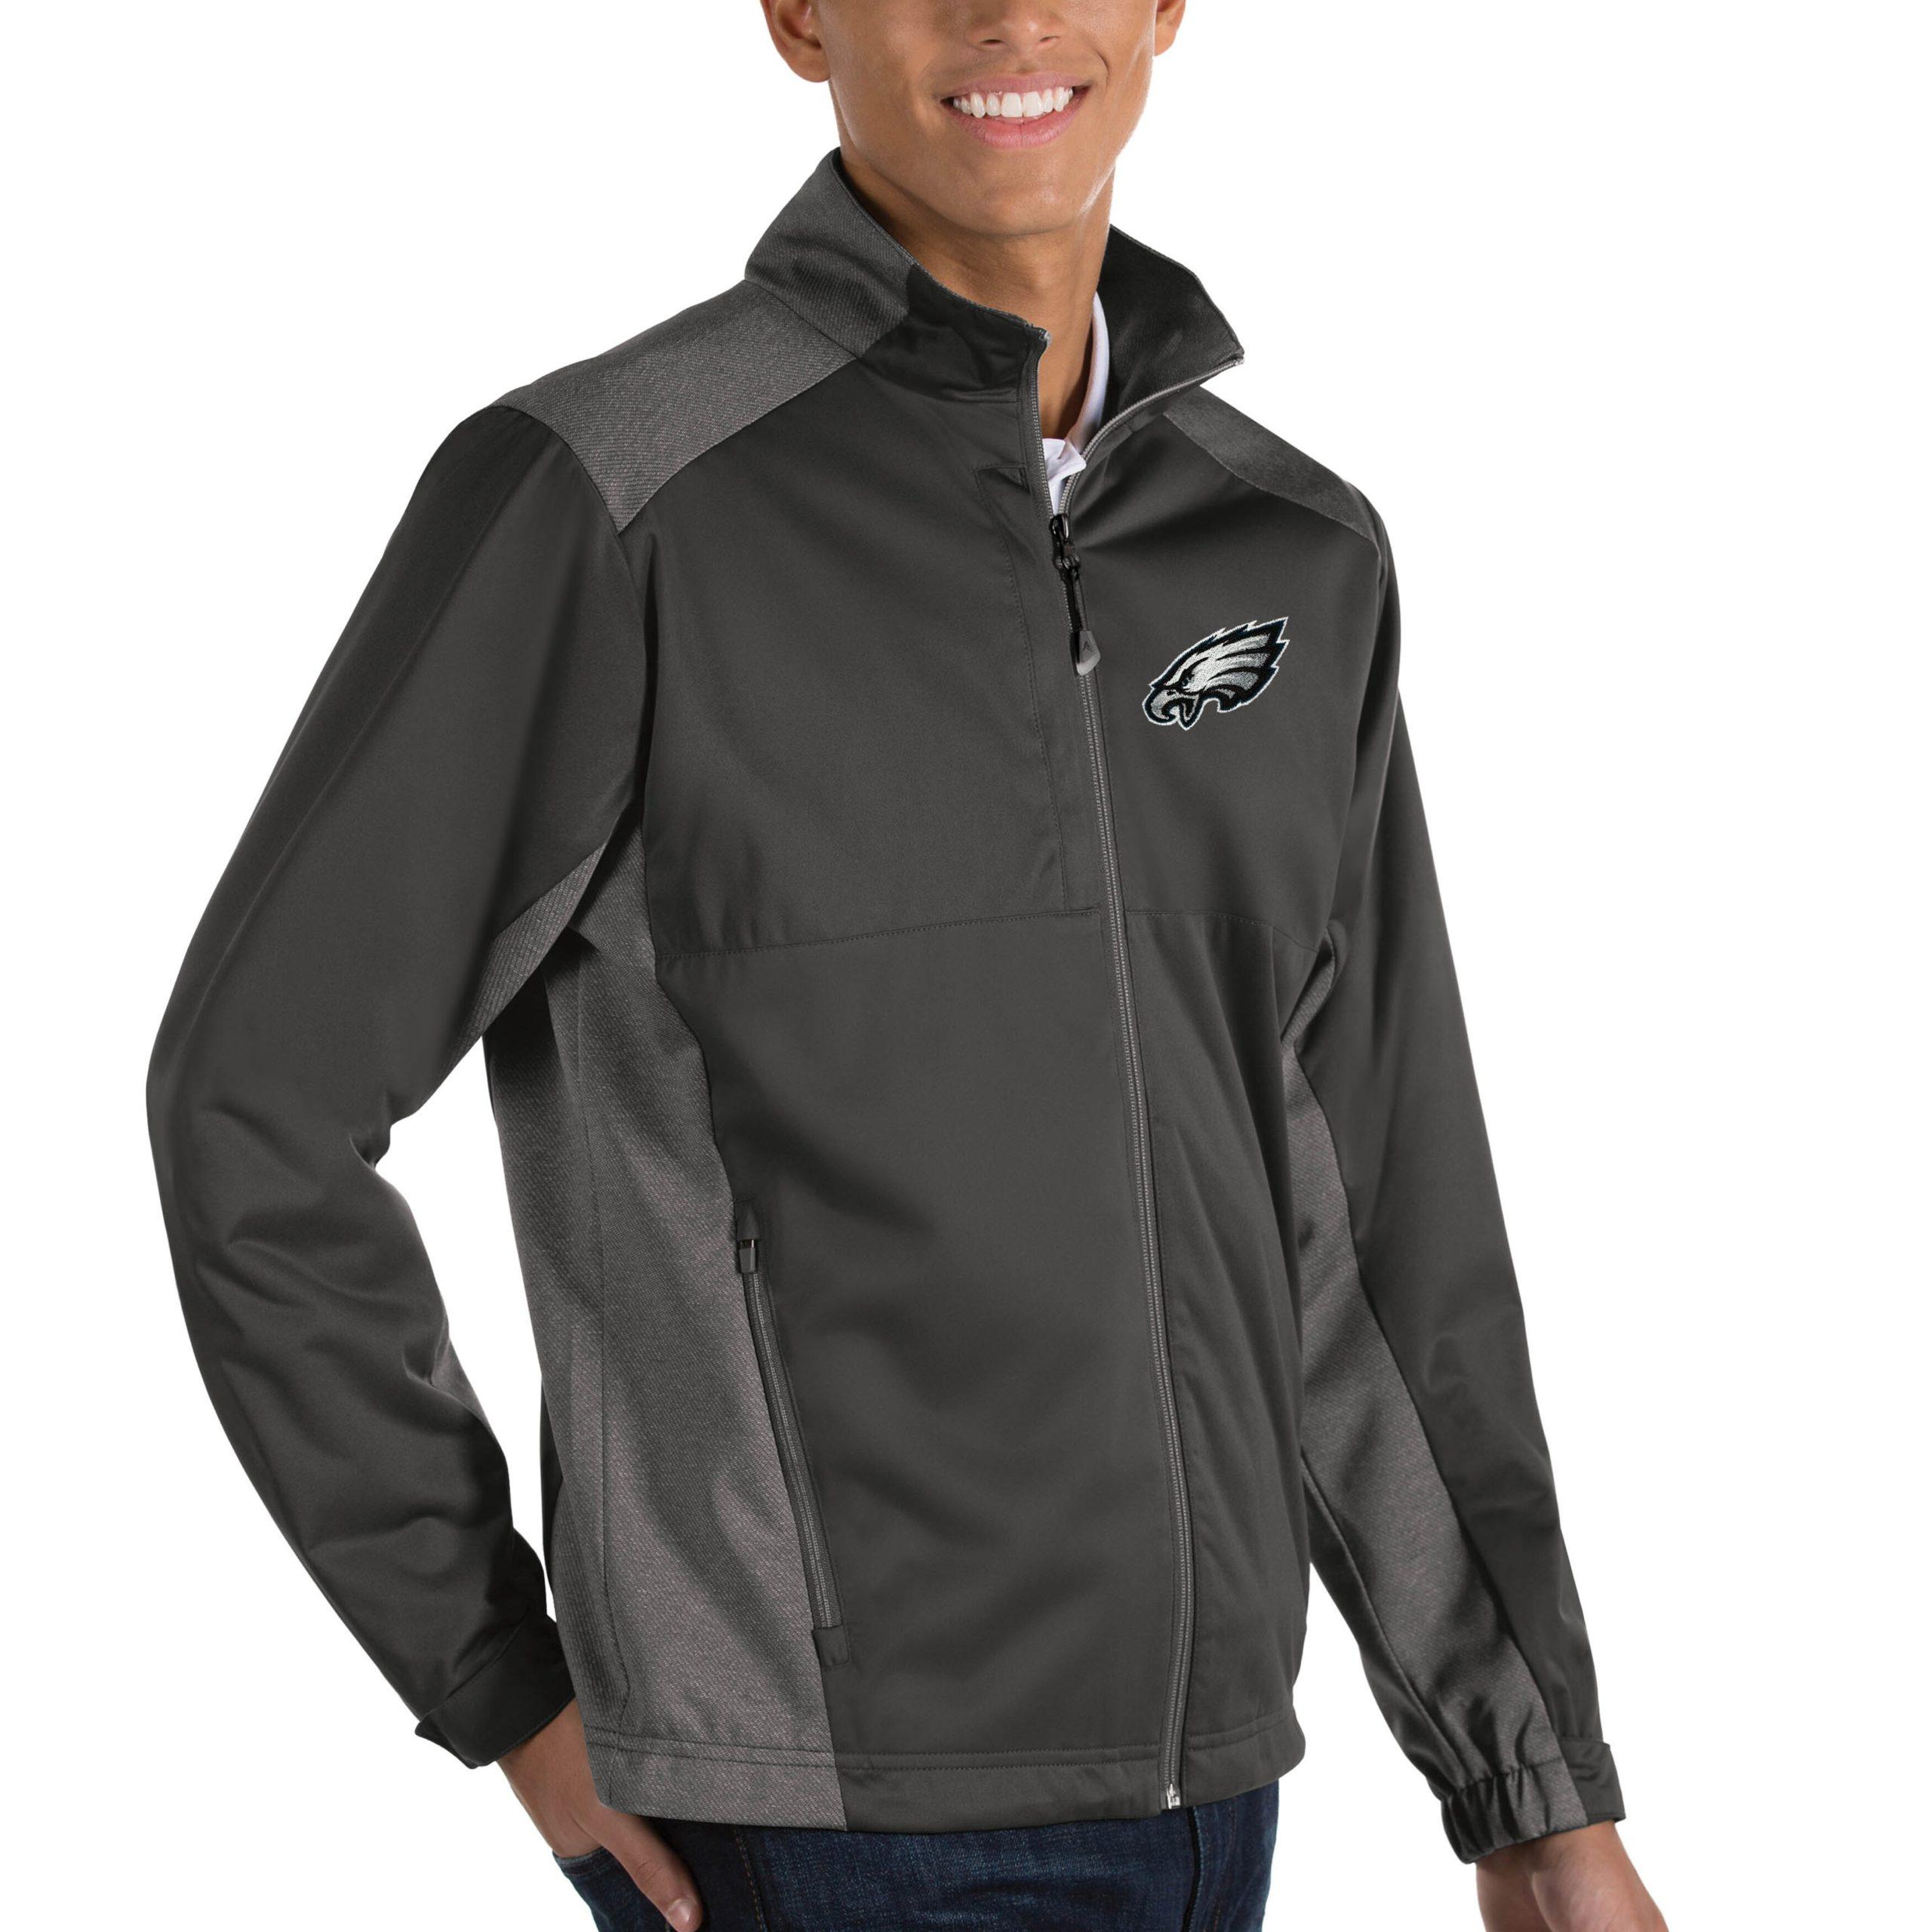 Philadelphia Eagles Antigua Revolve Big & Tall Full-Zip Jacket - Heather Charcoal